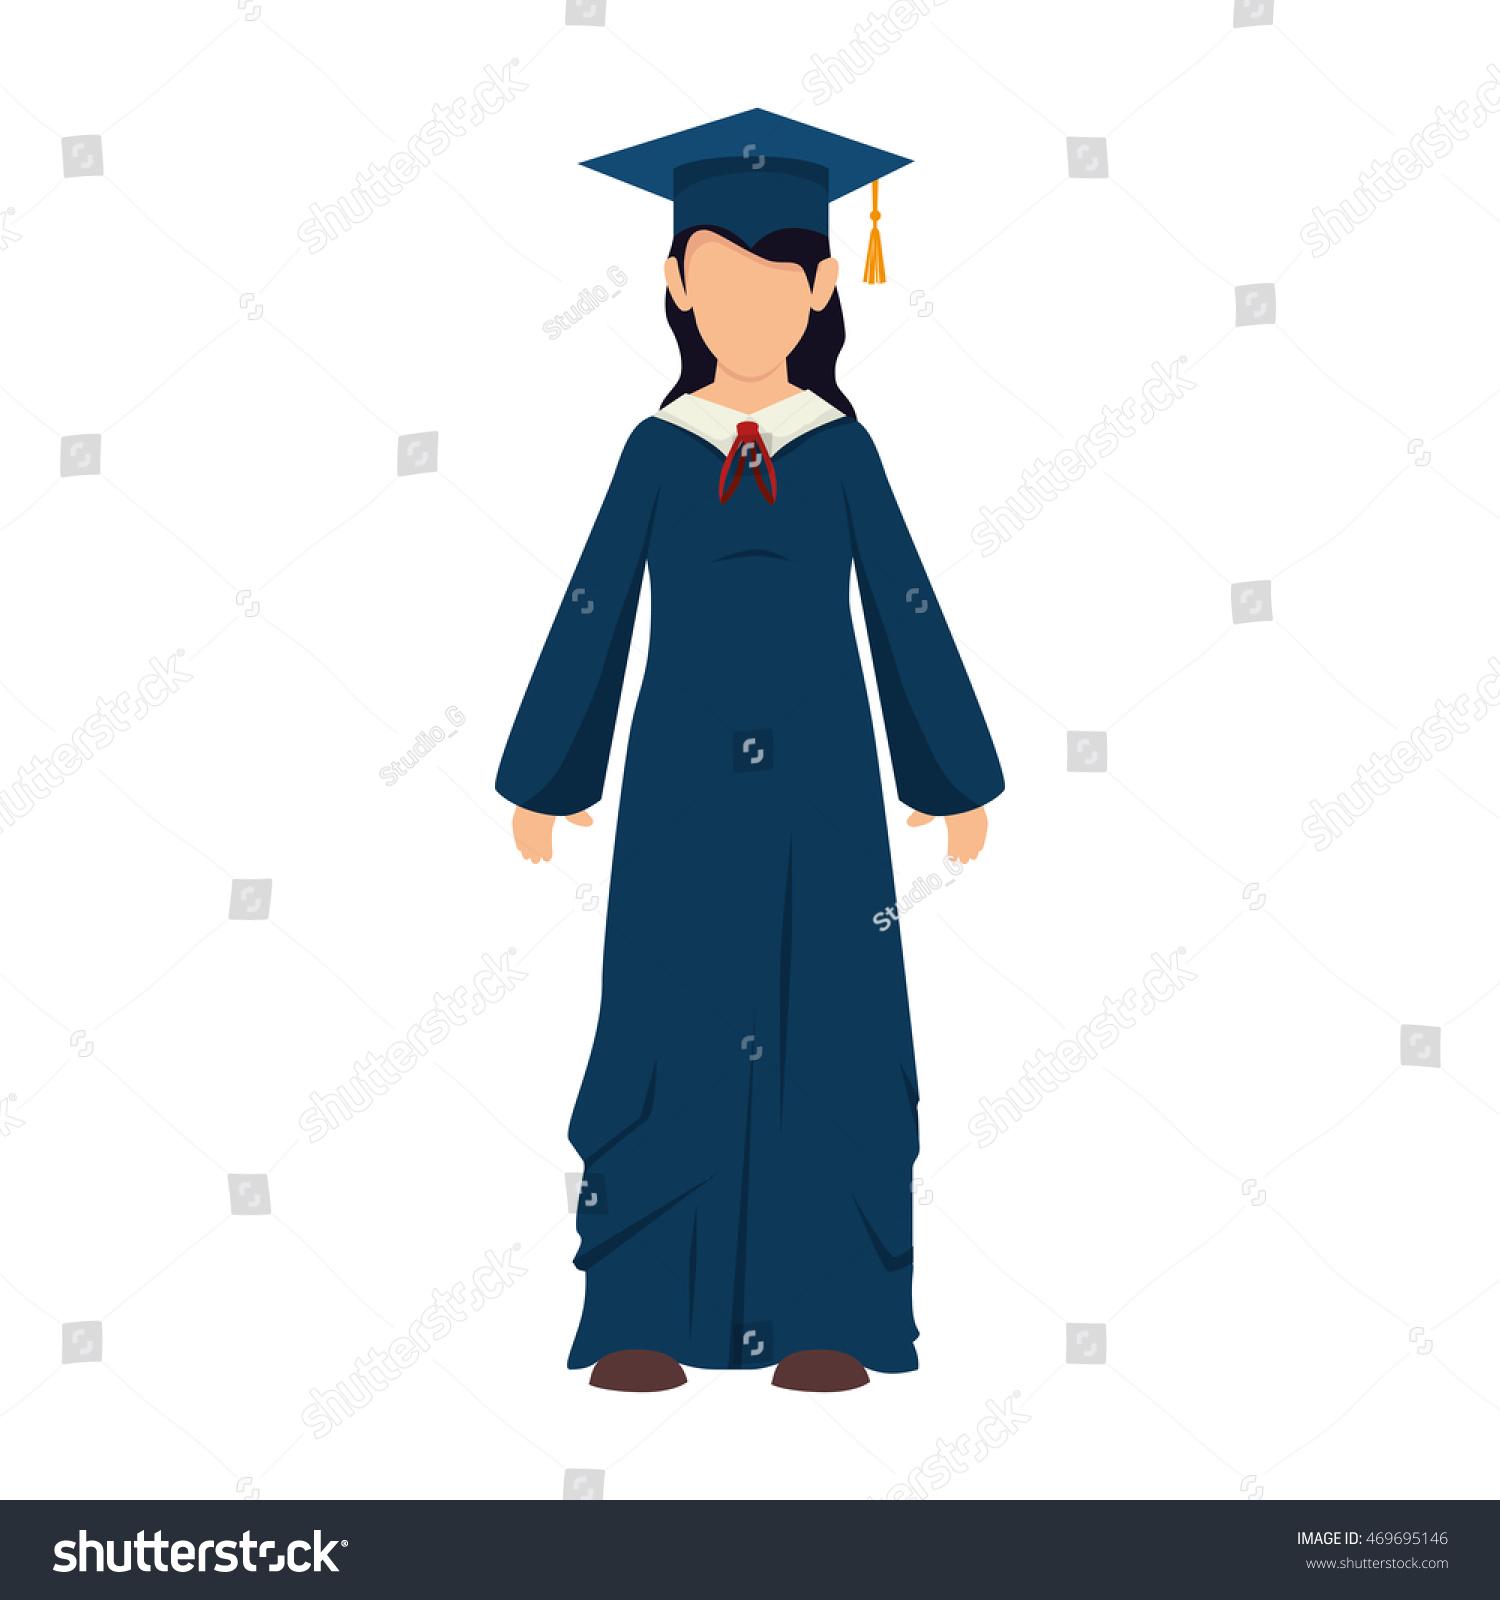 Women Girl Hat Graduate Graduation Gown Stock Vector (Royalty Free ...